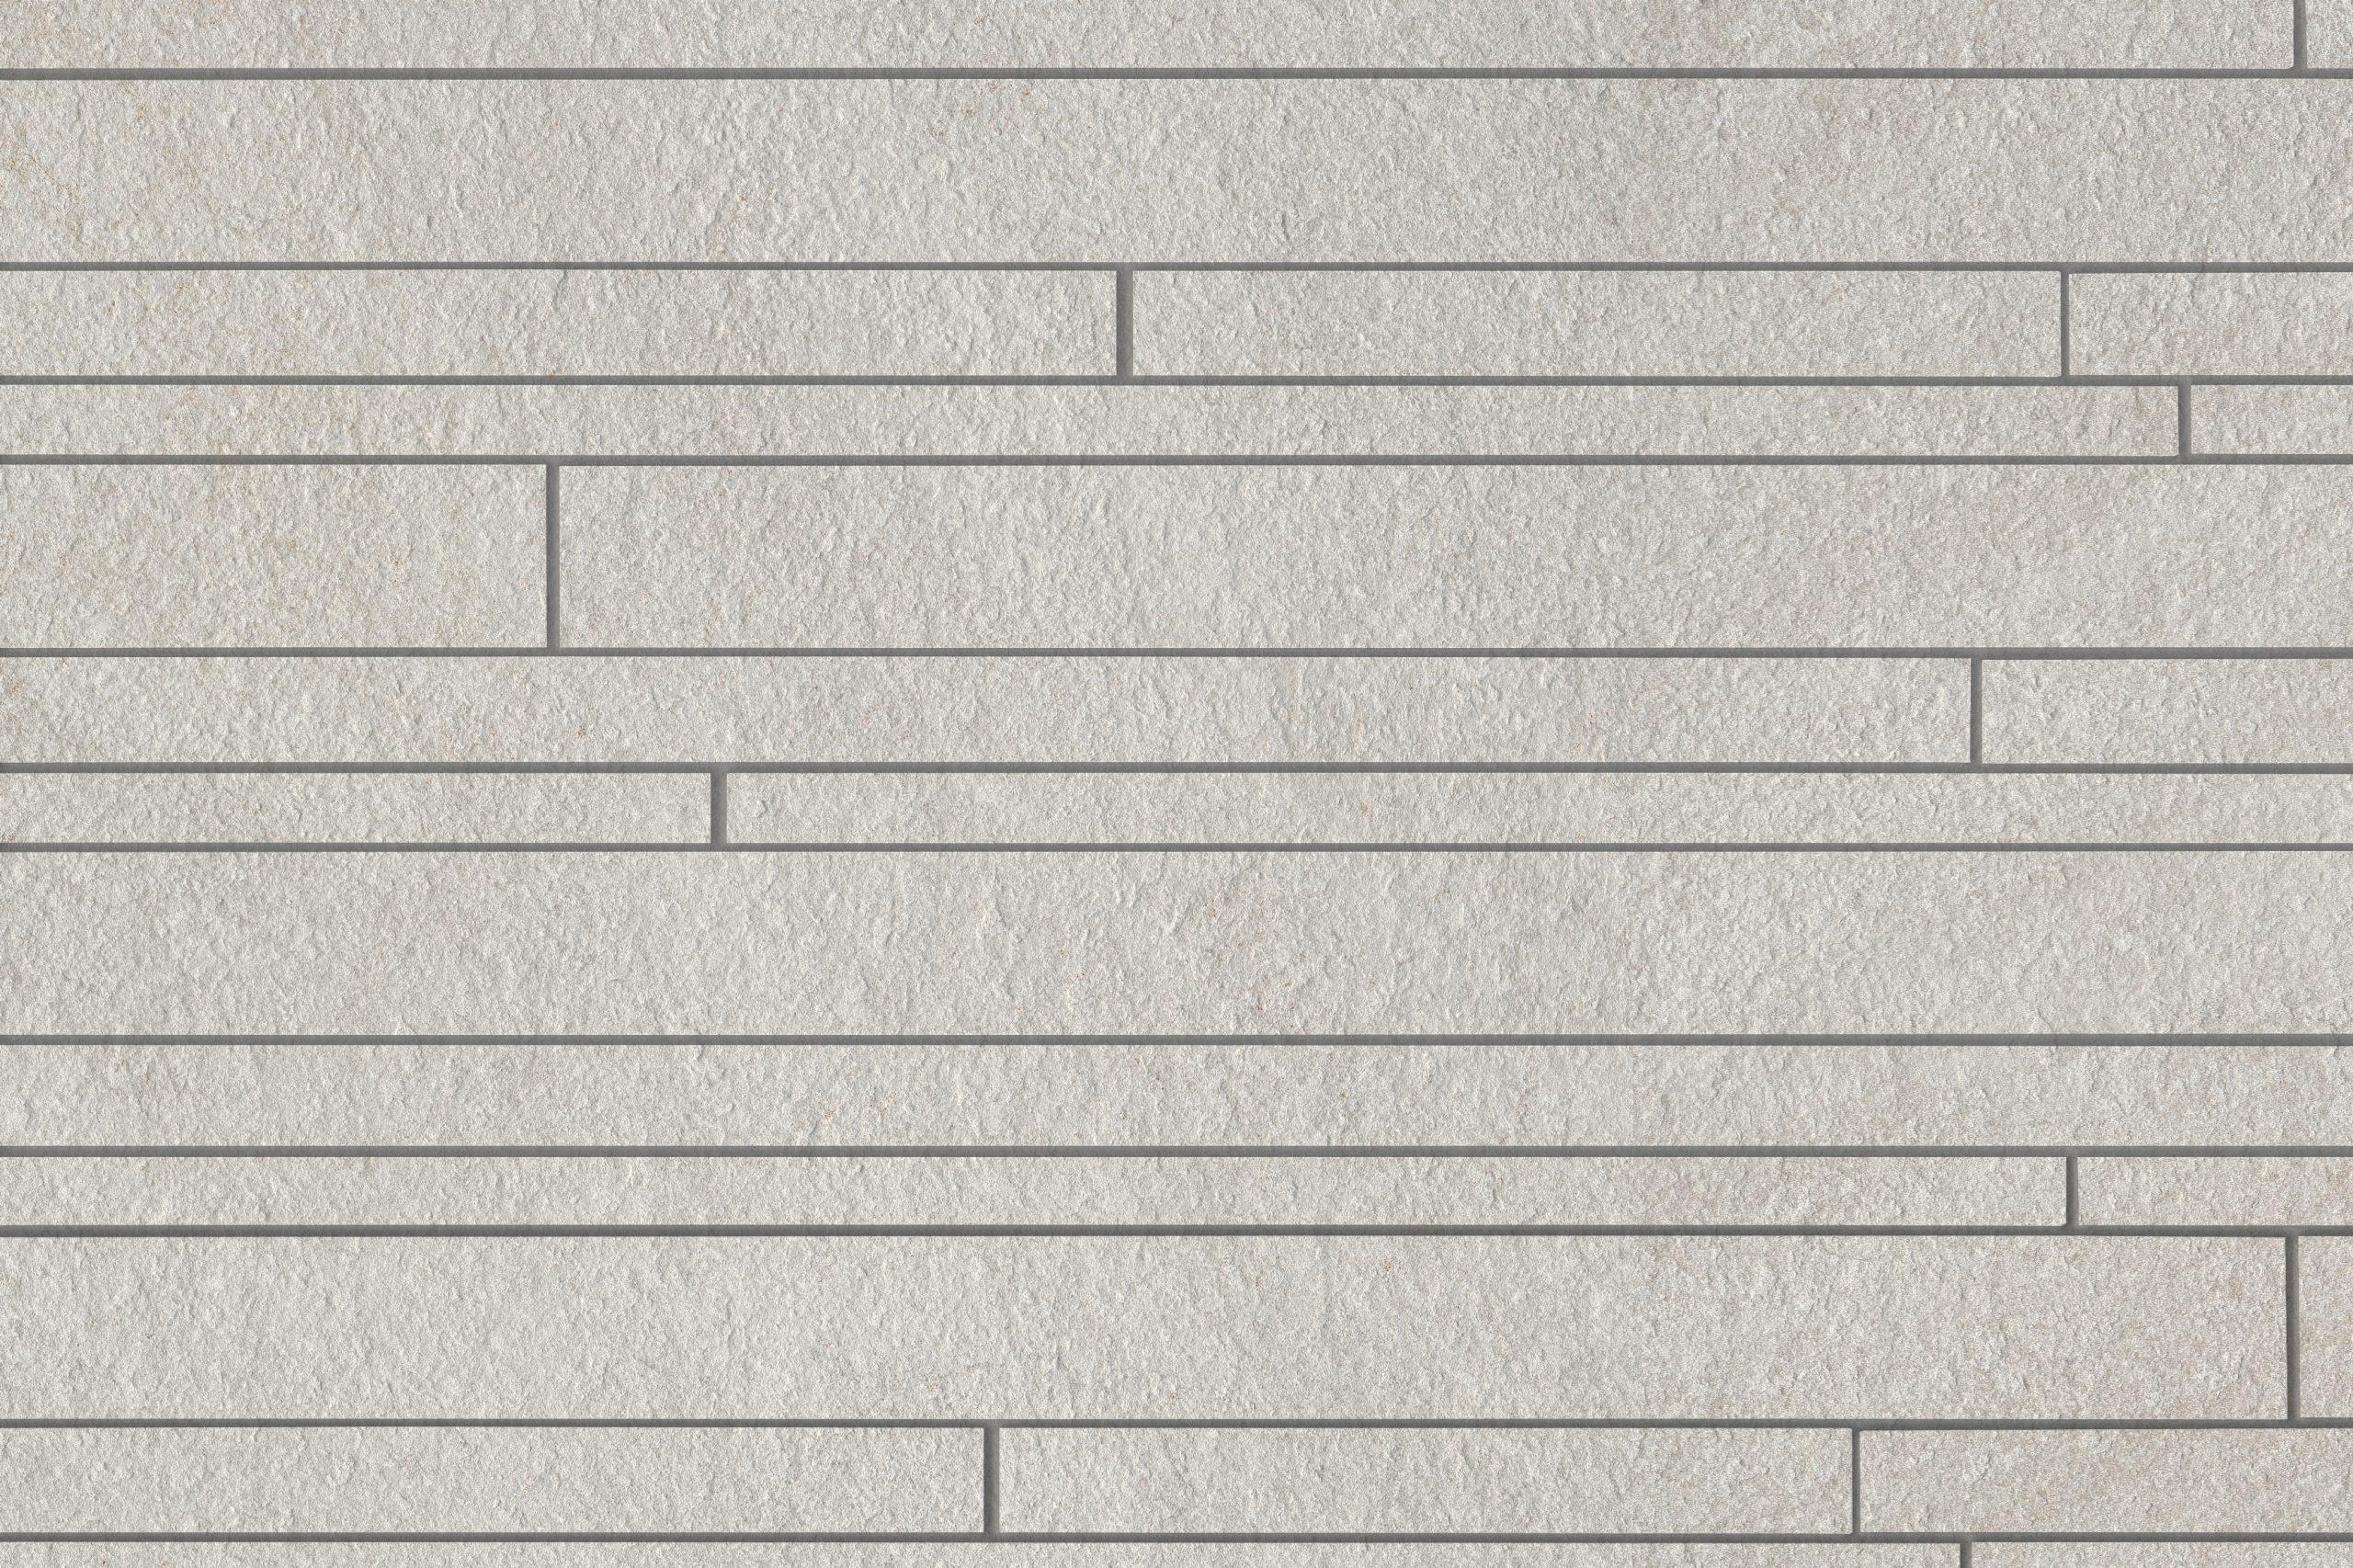 Mosaiik Brick Quarzite ice 17670 R10/B rect. 30x60x0,95 I sort - Hansas Plaadimaailm